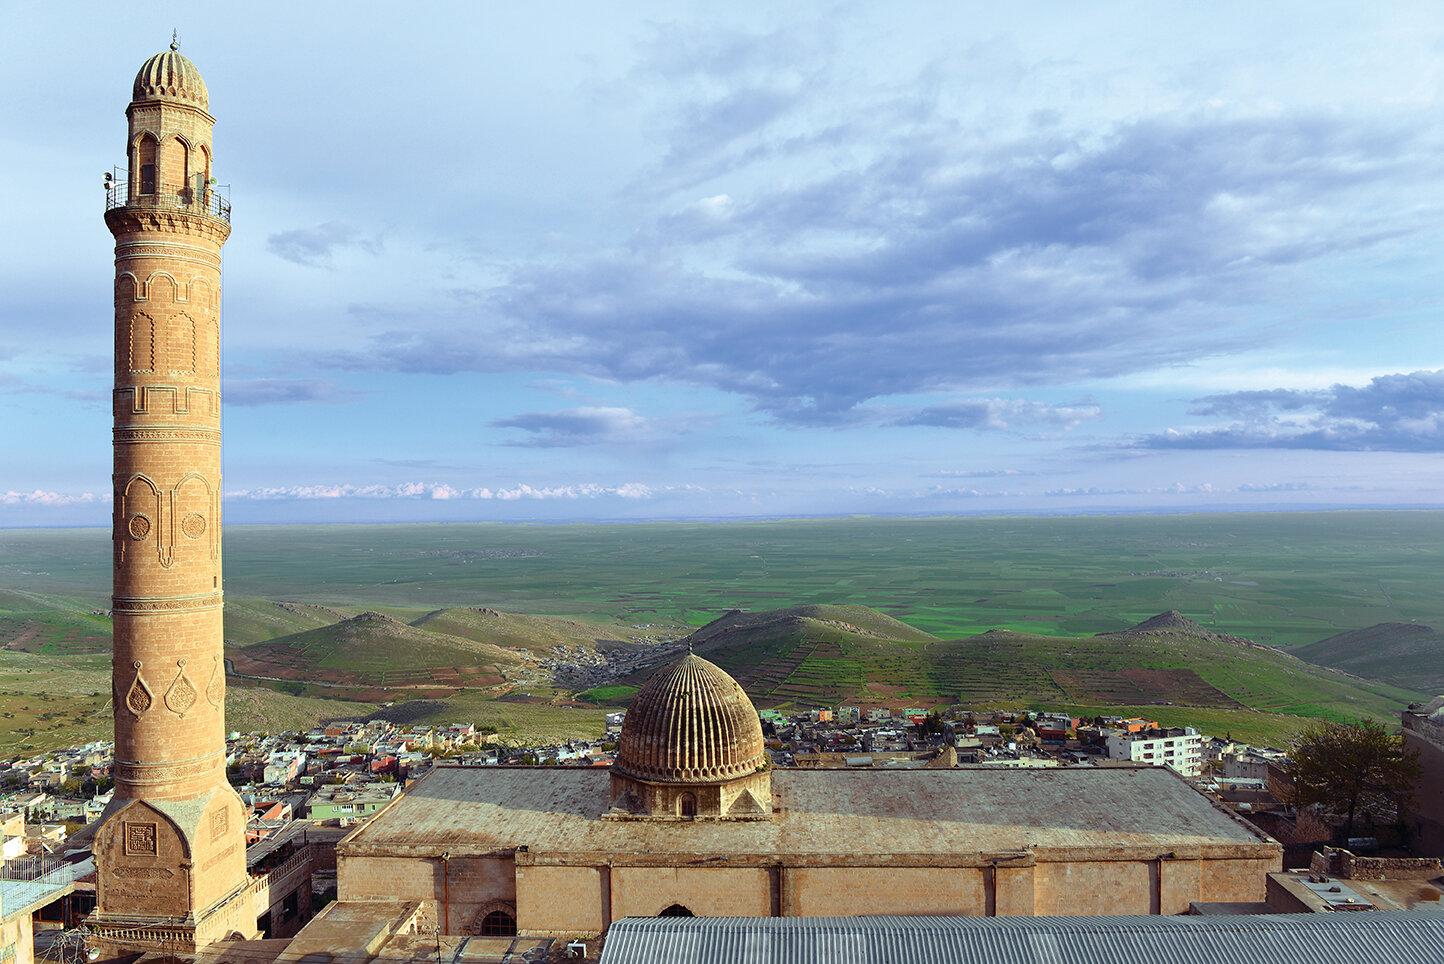 Mardin Ulu Cami